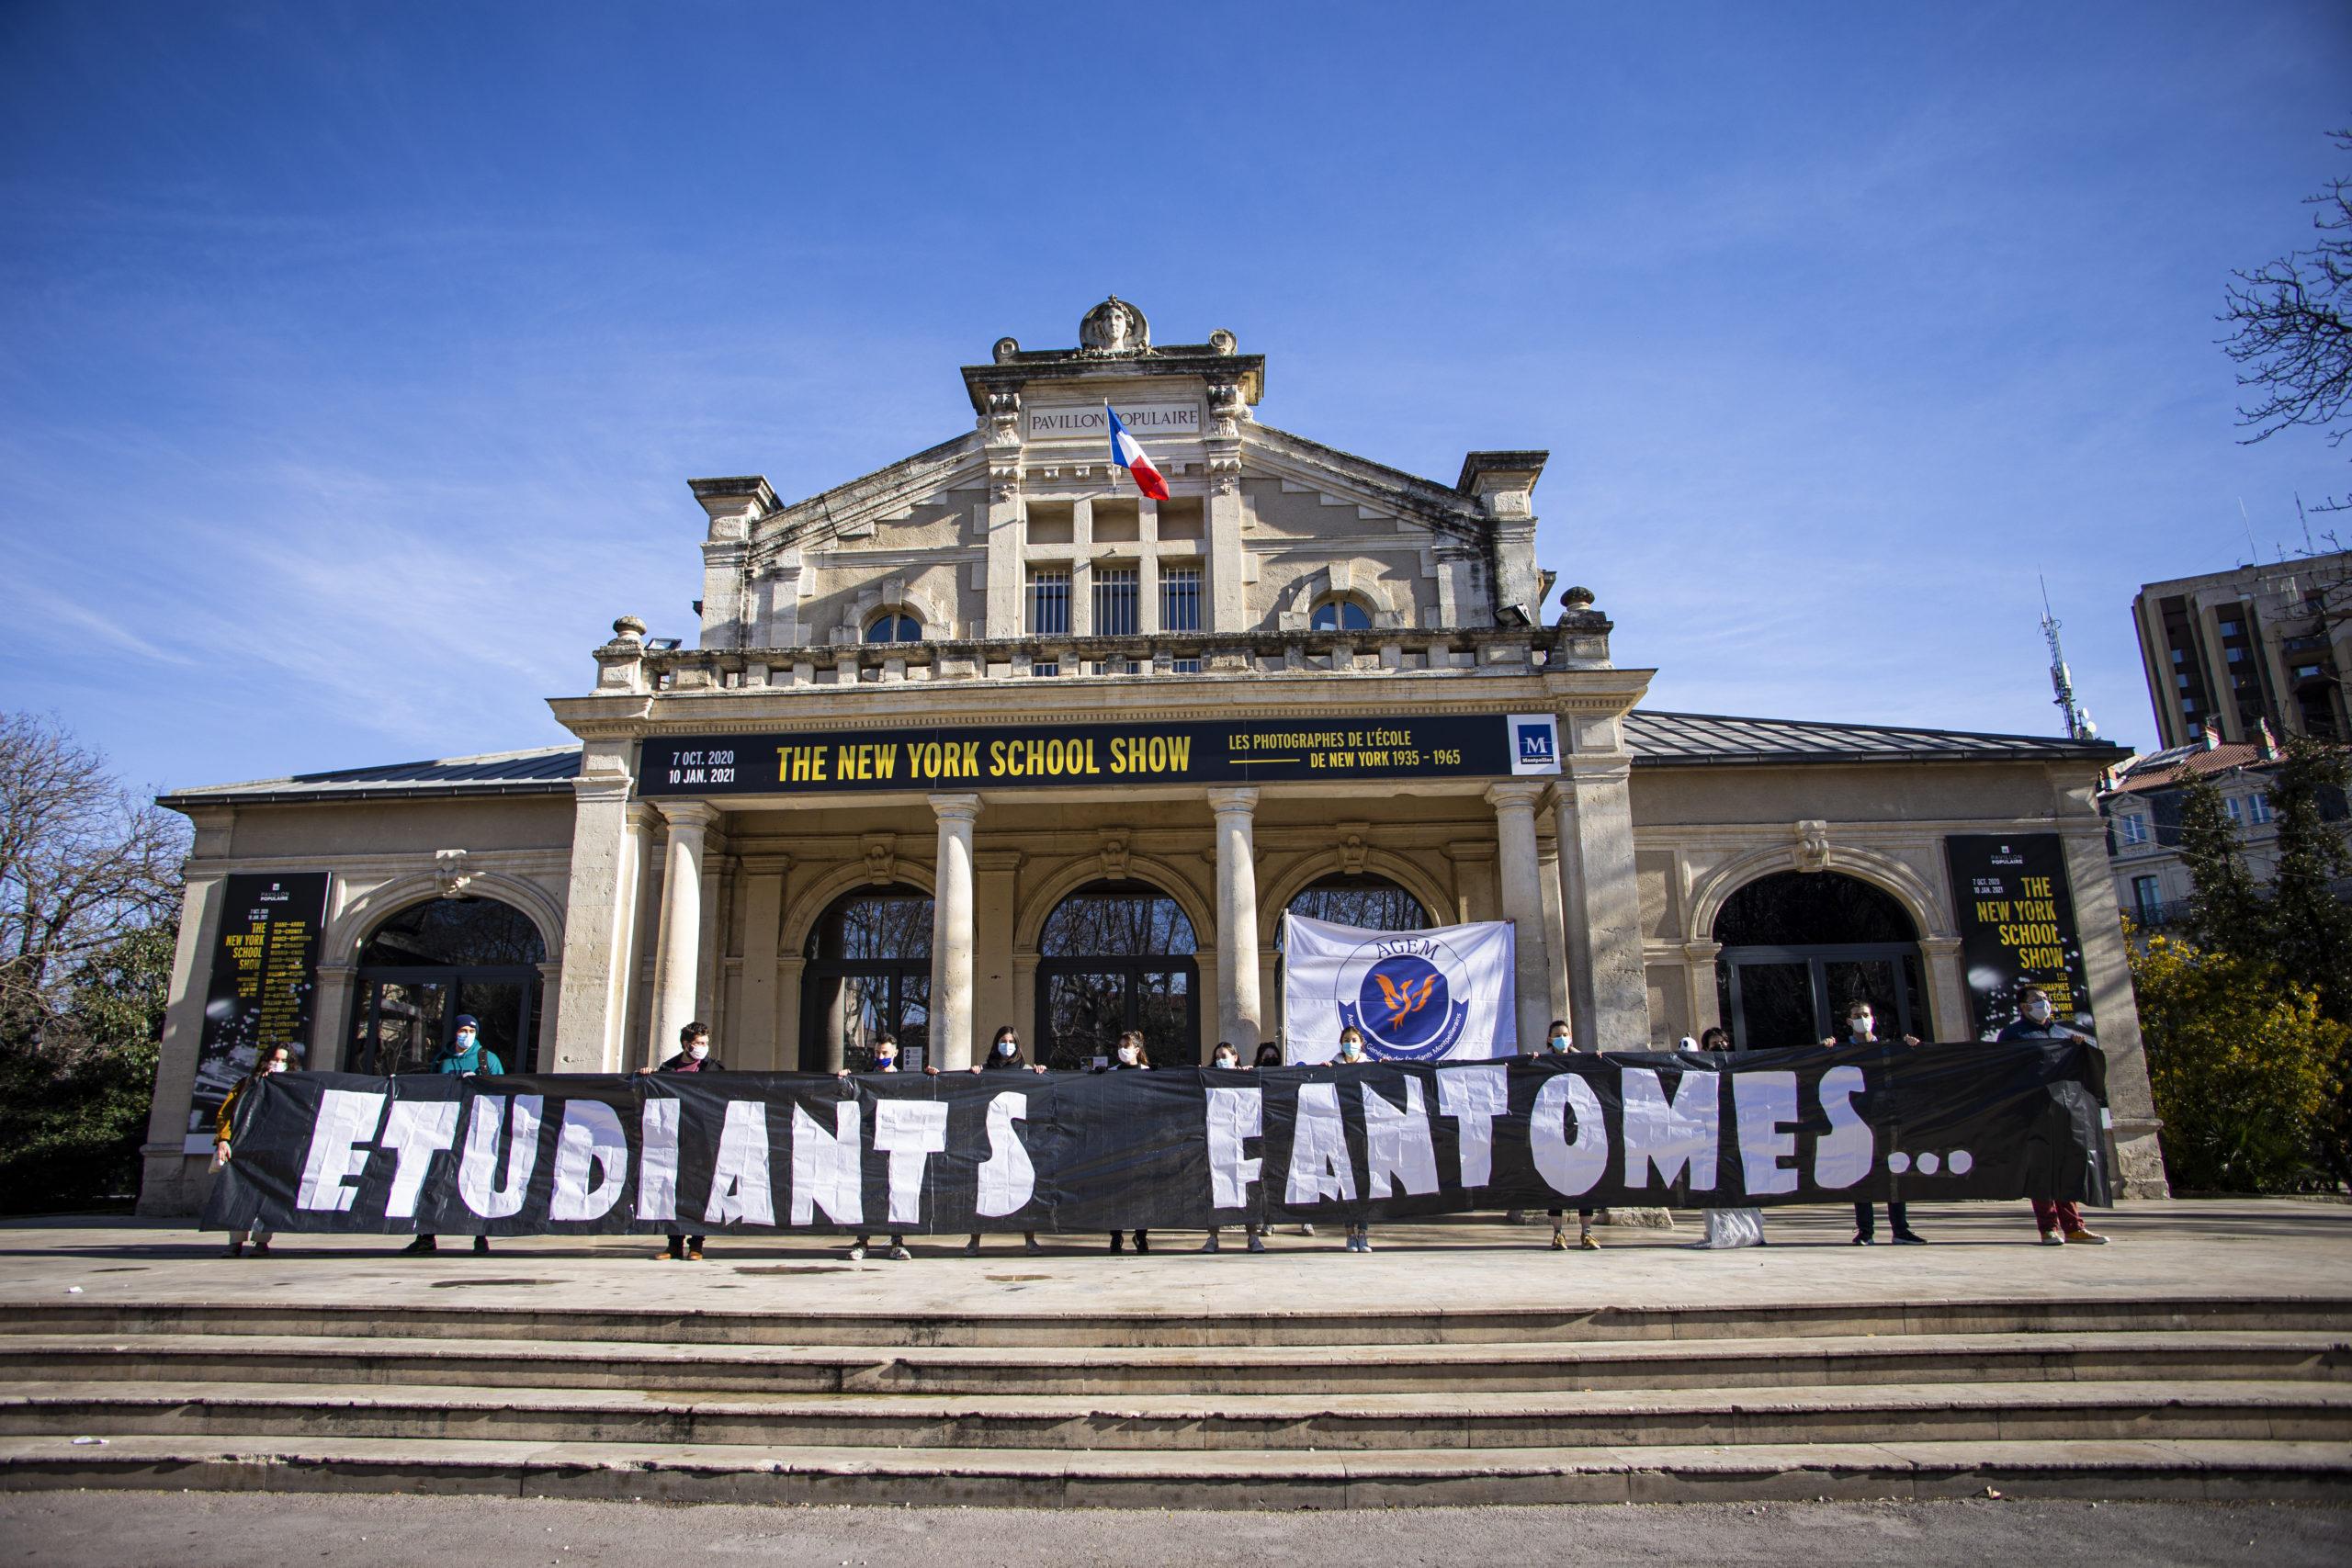 Manifestions Etudiants Fantômes Montpellier